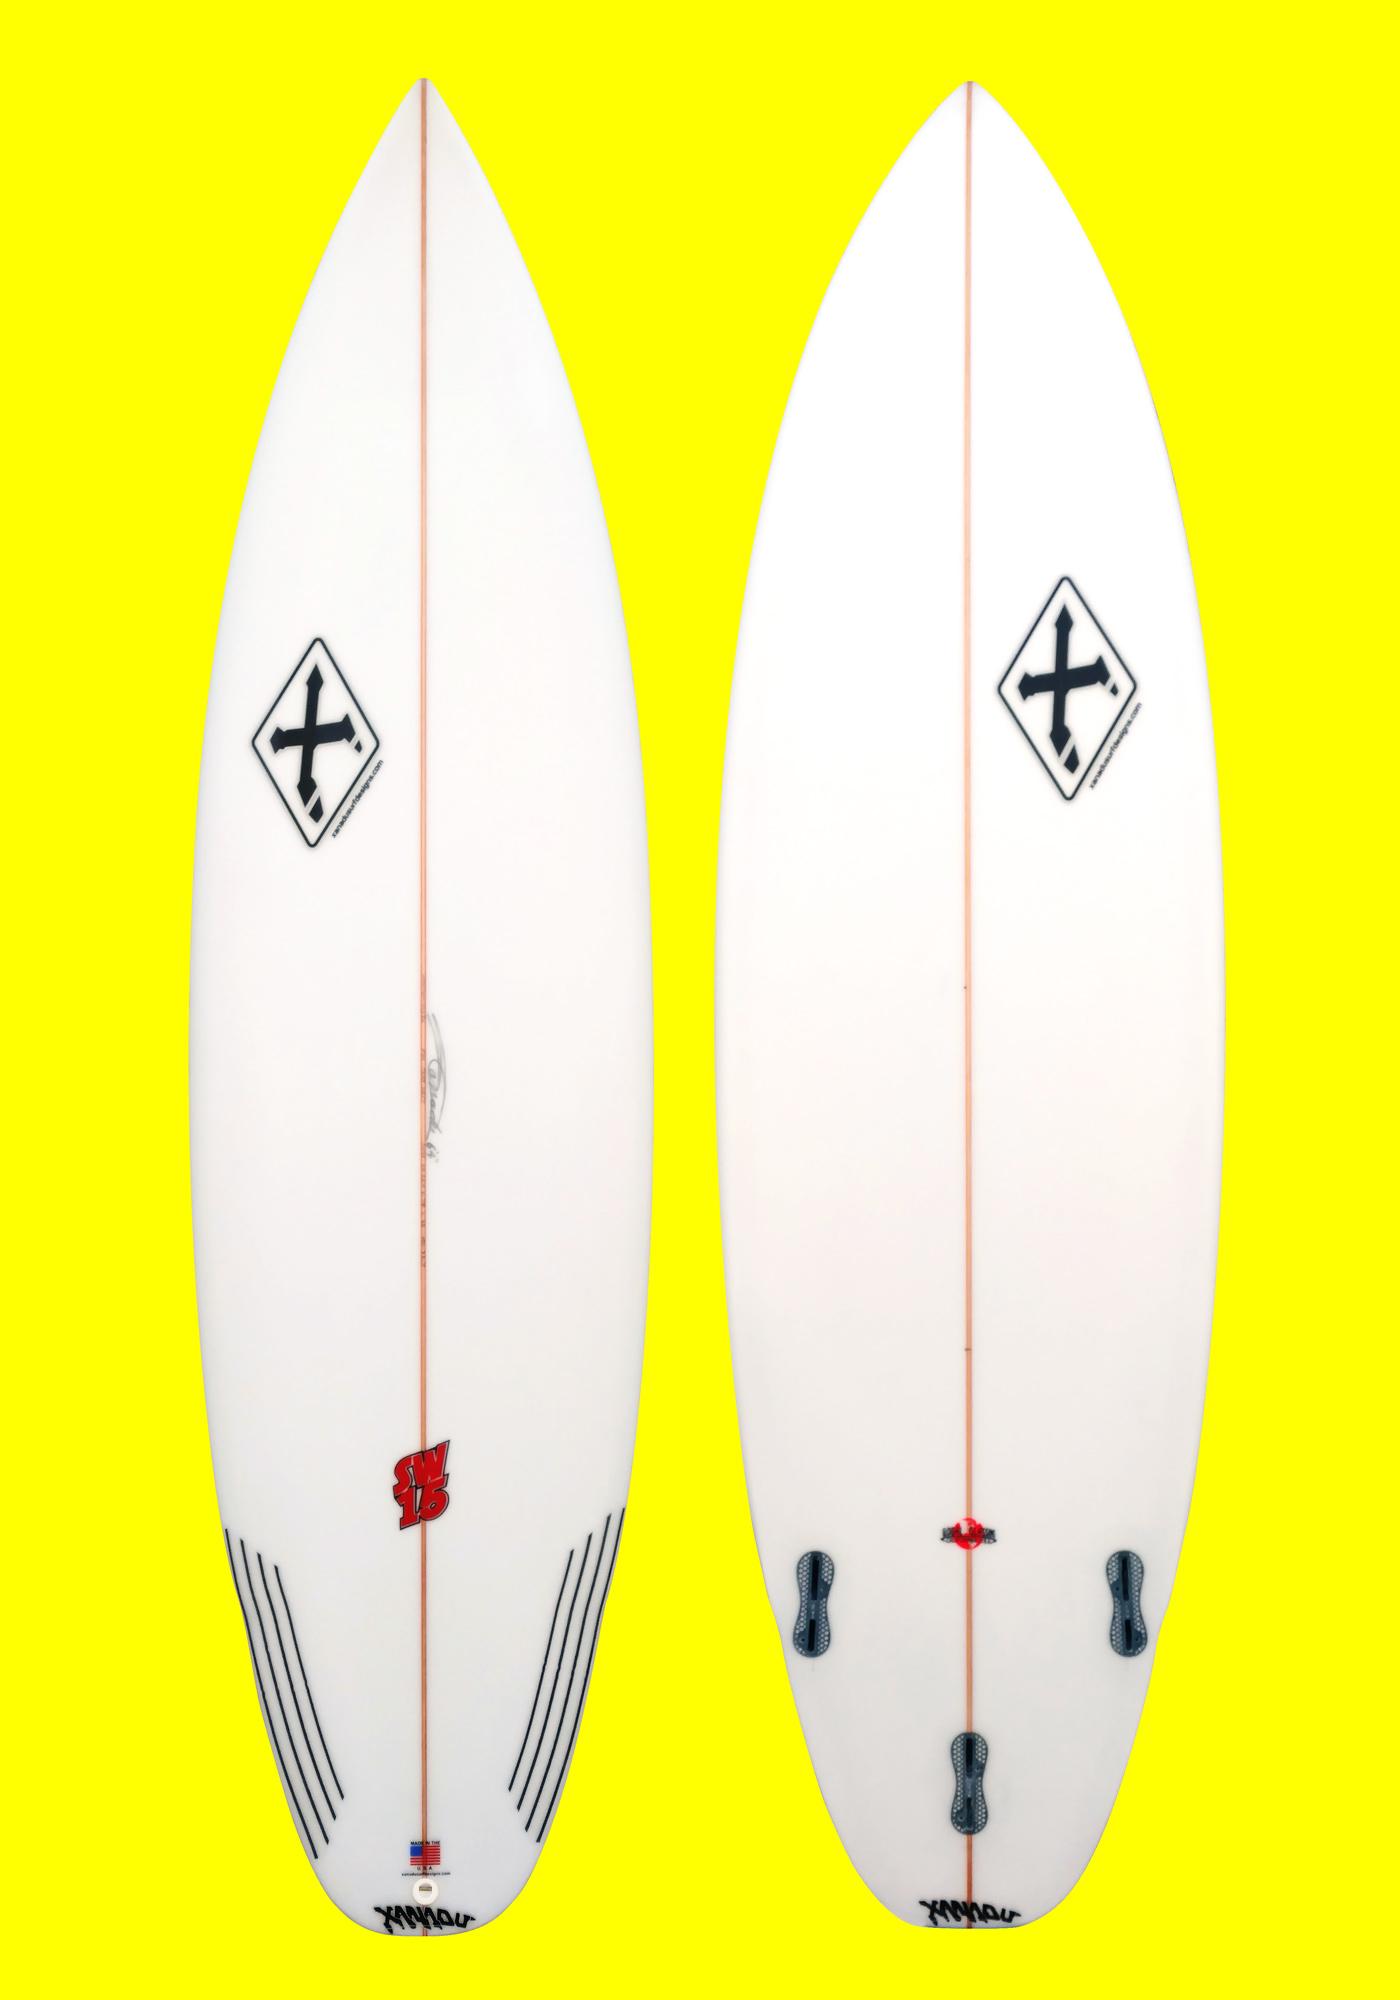 xanadu surfboards - sw15